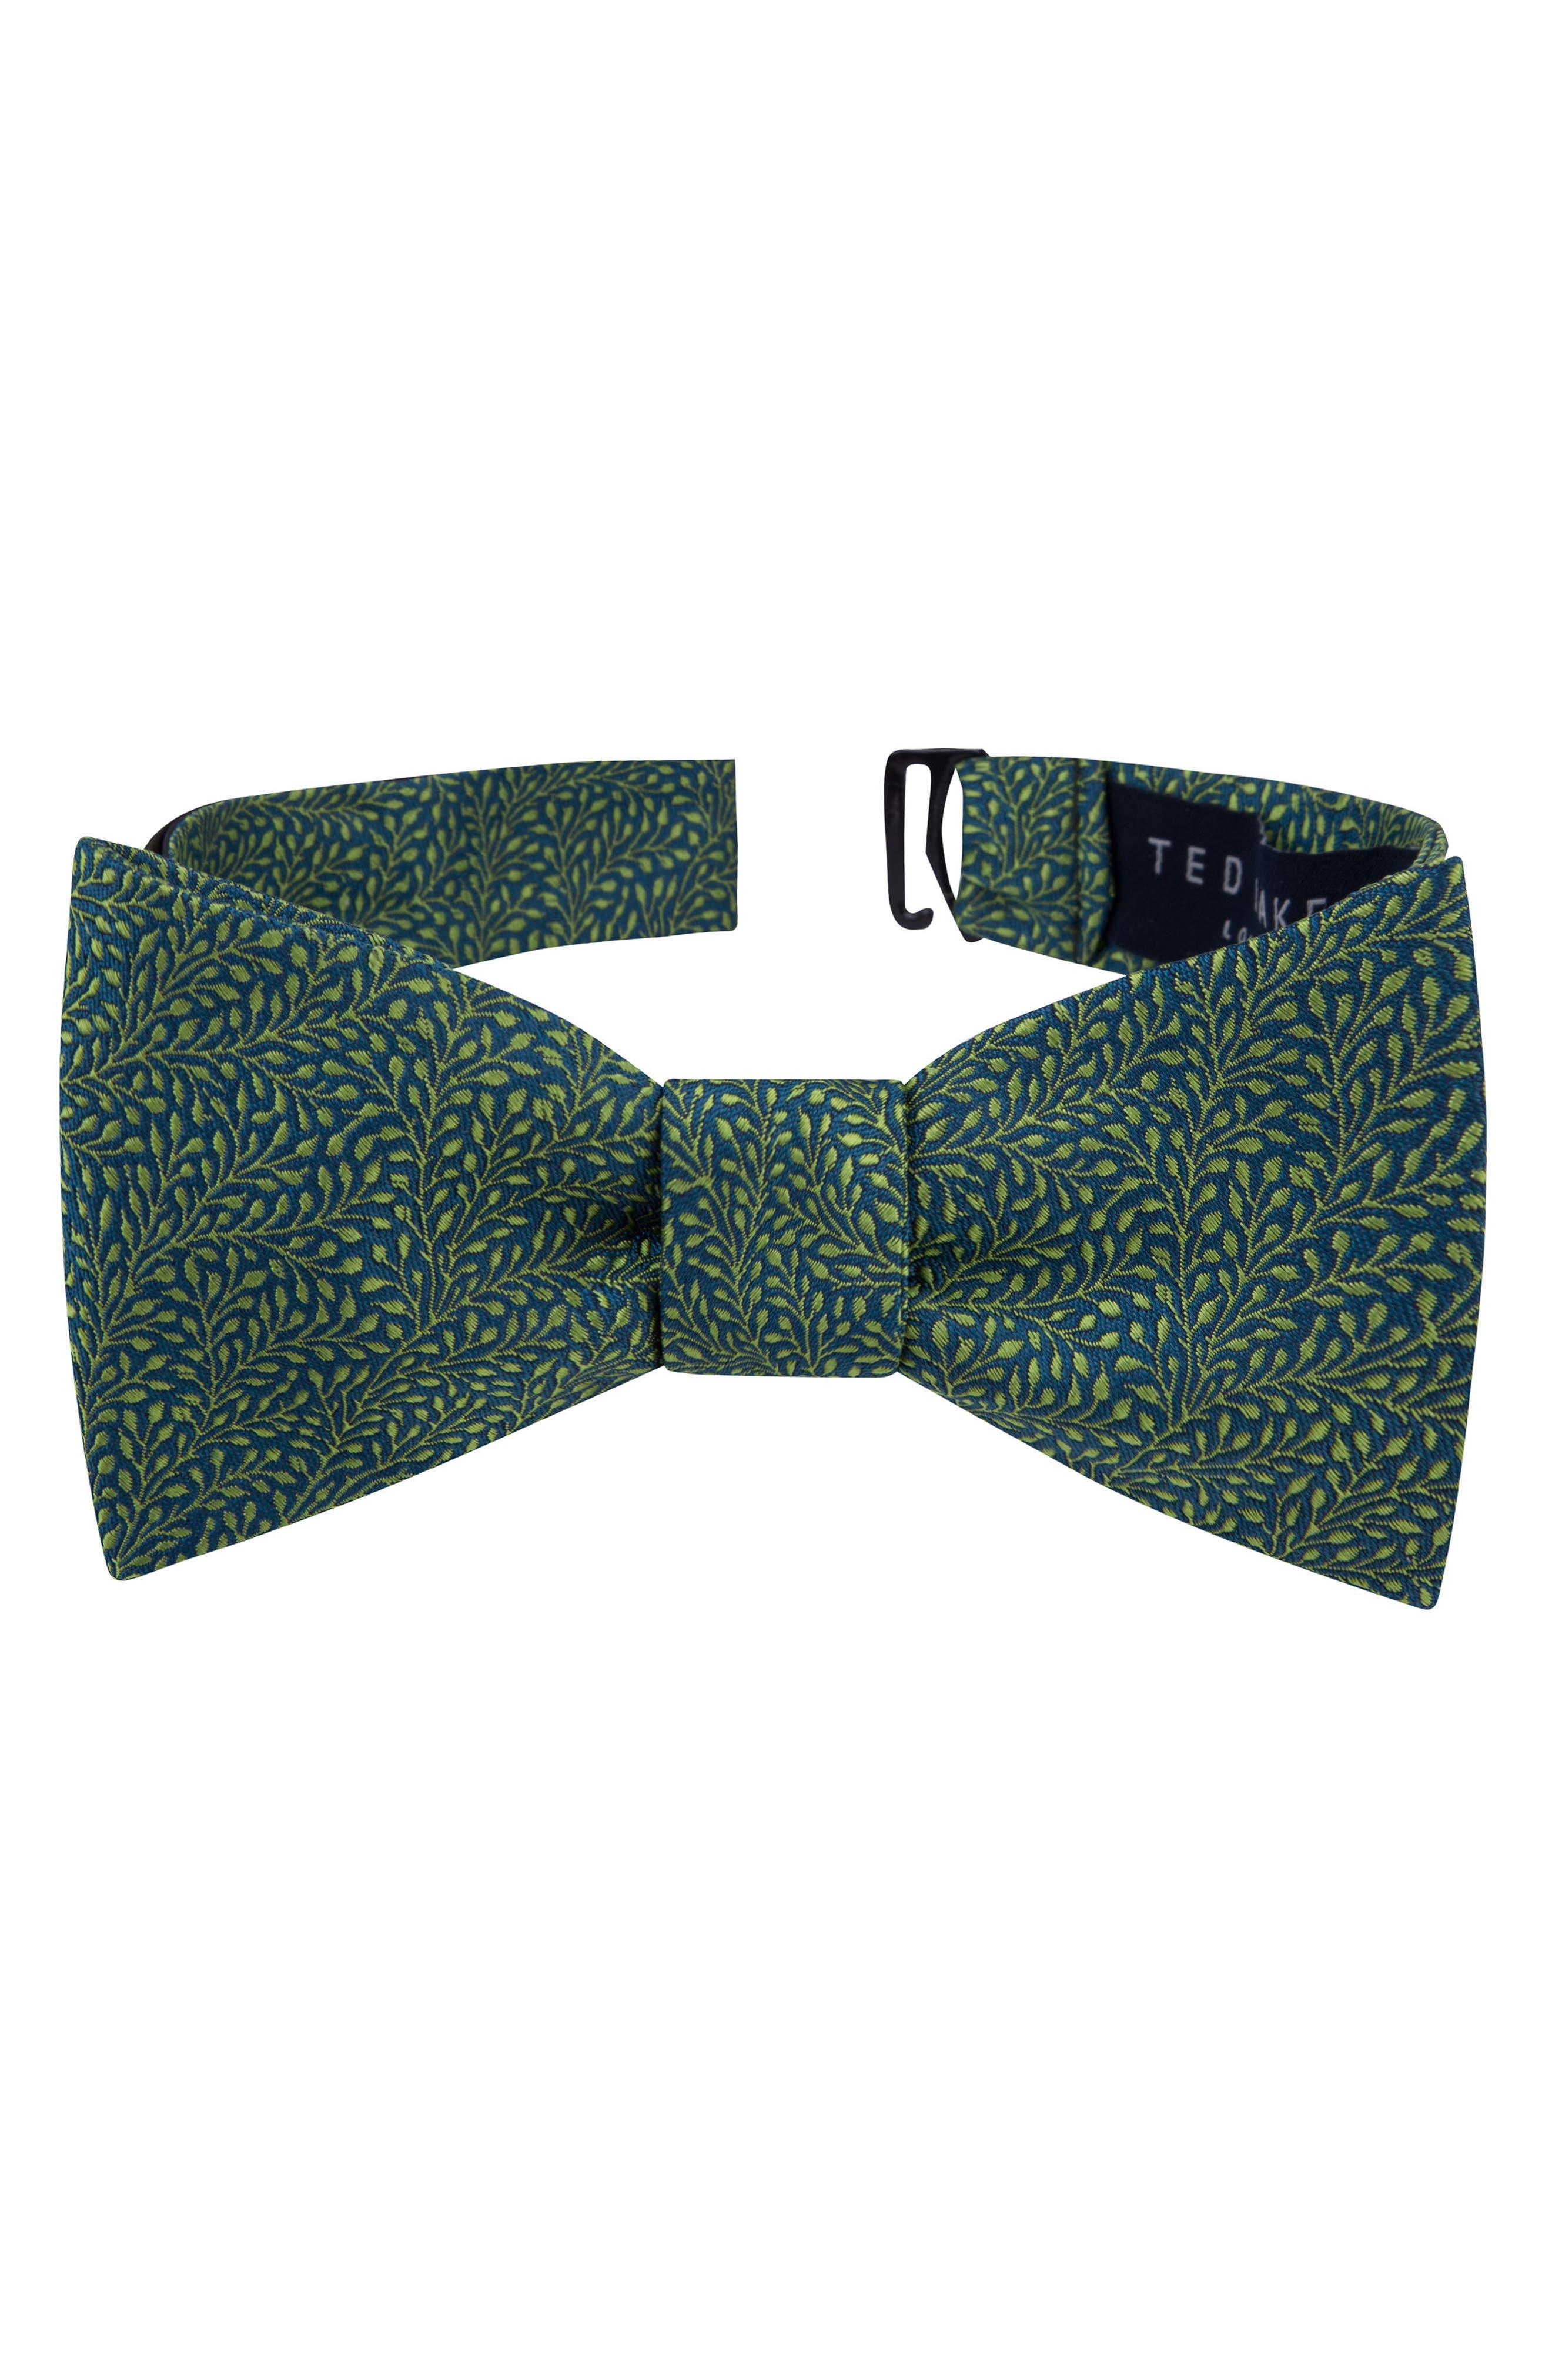 Grand Botanical Silk Bow Tie,                             Main thumbnail 1, color,                             300